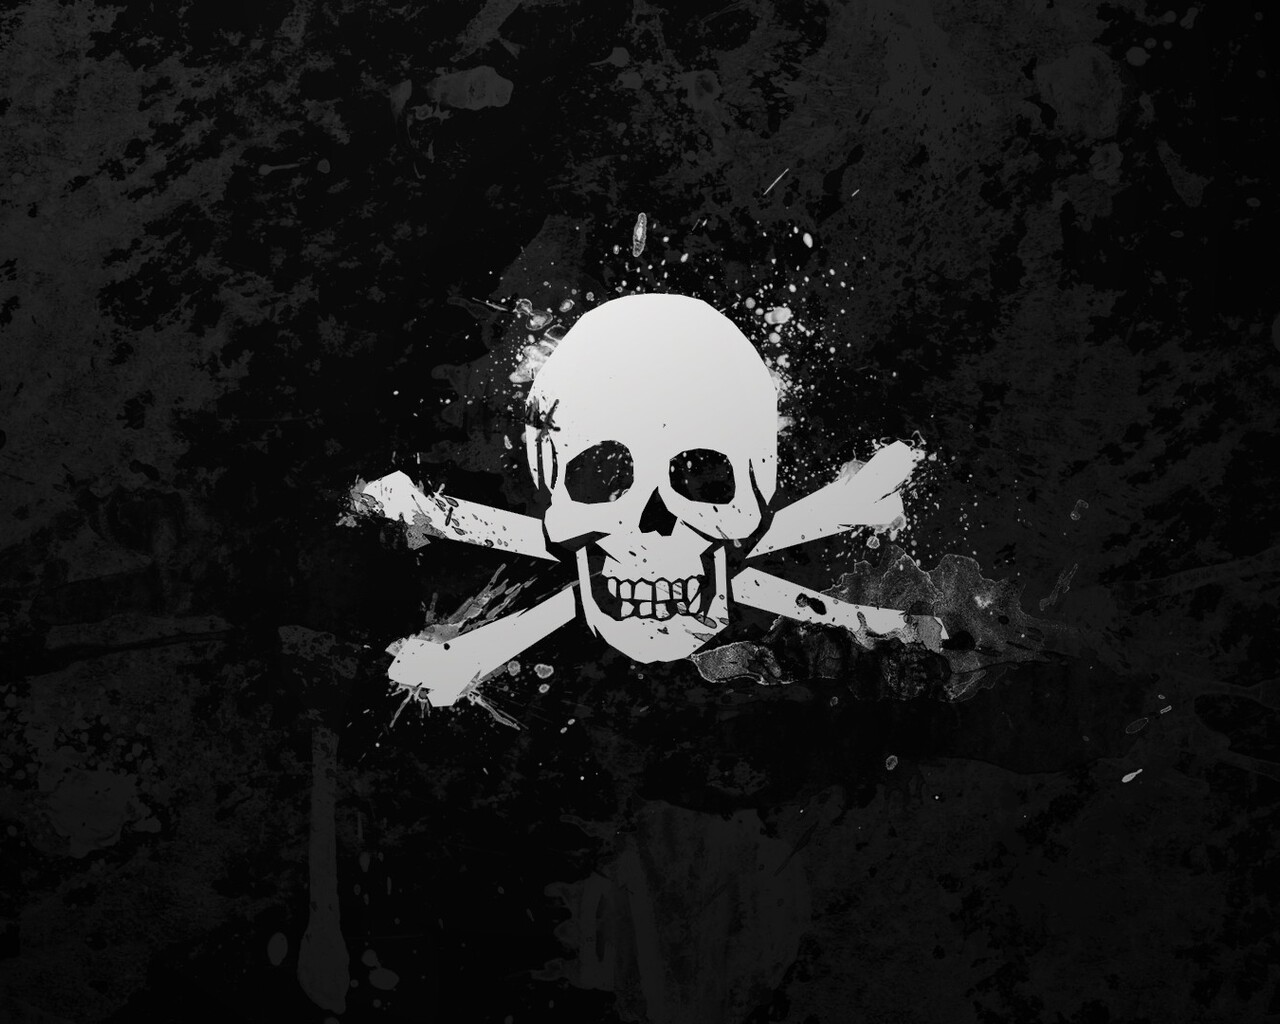 Dark Skull Background Posted By Ryan Simpson